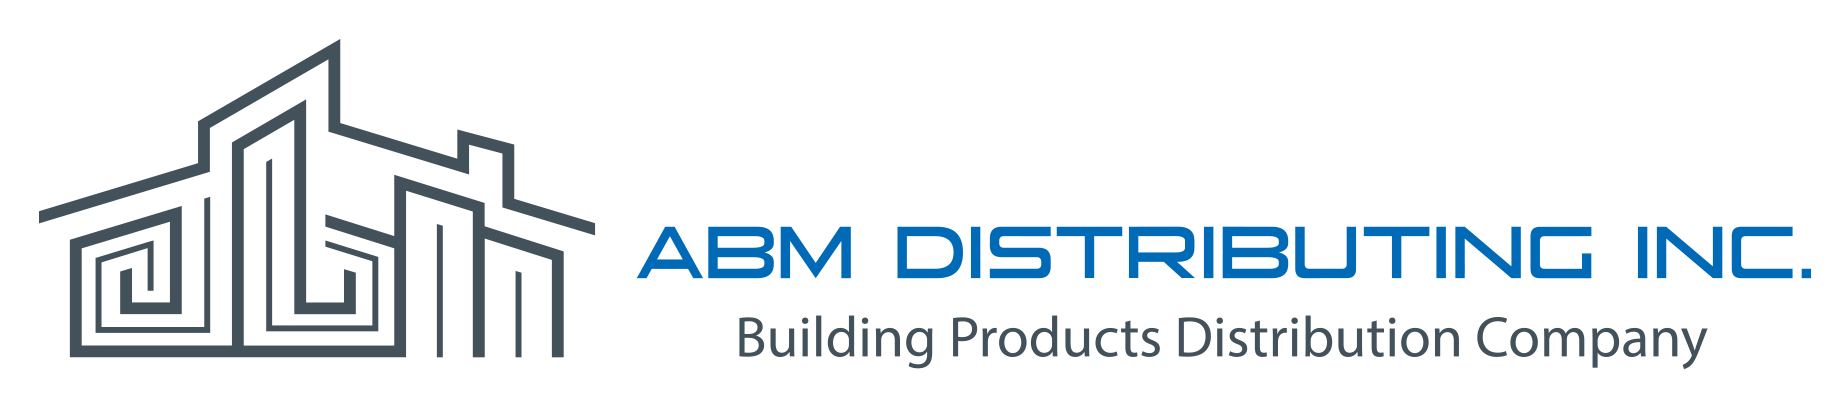 ABM Distributing